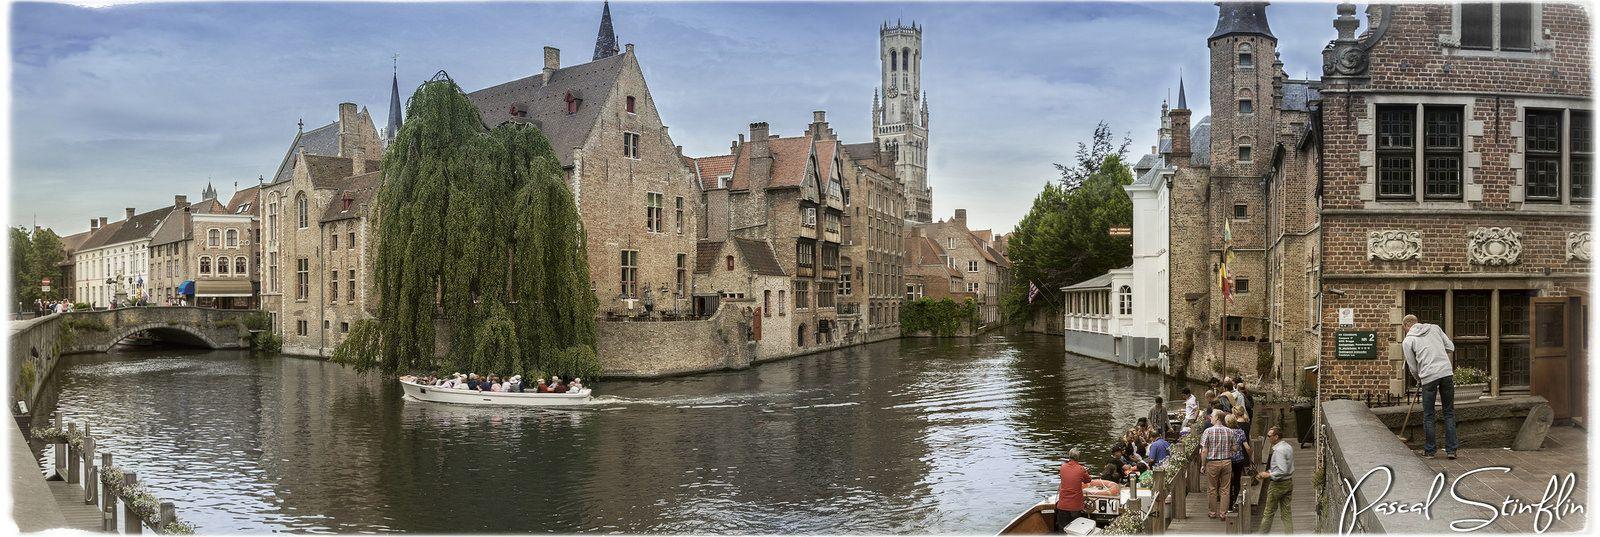 Brugge Panorama I | por STINFLIN Pascal